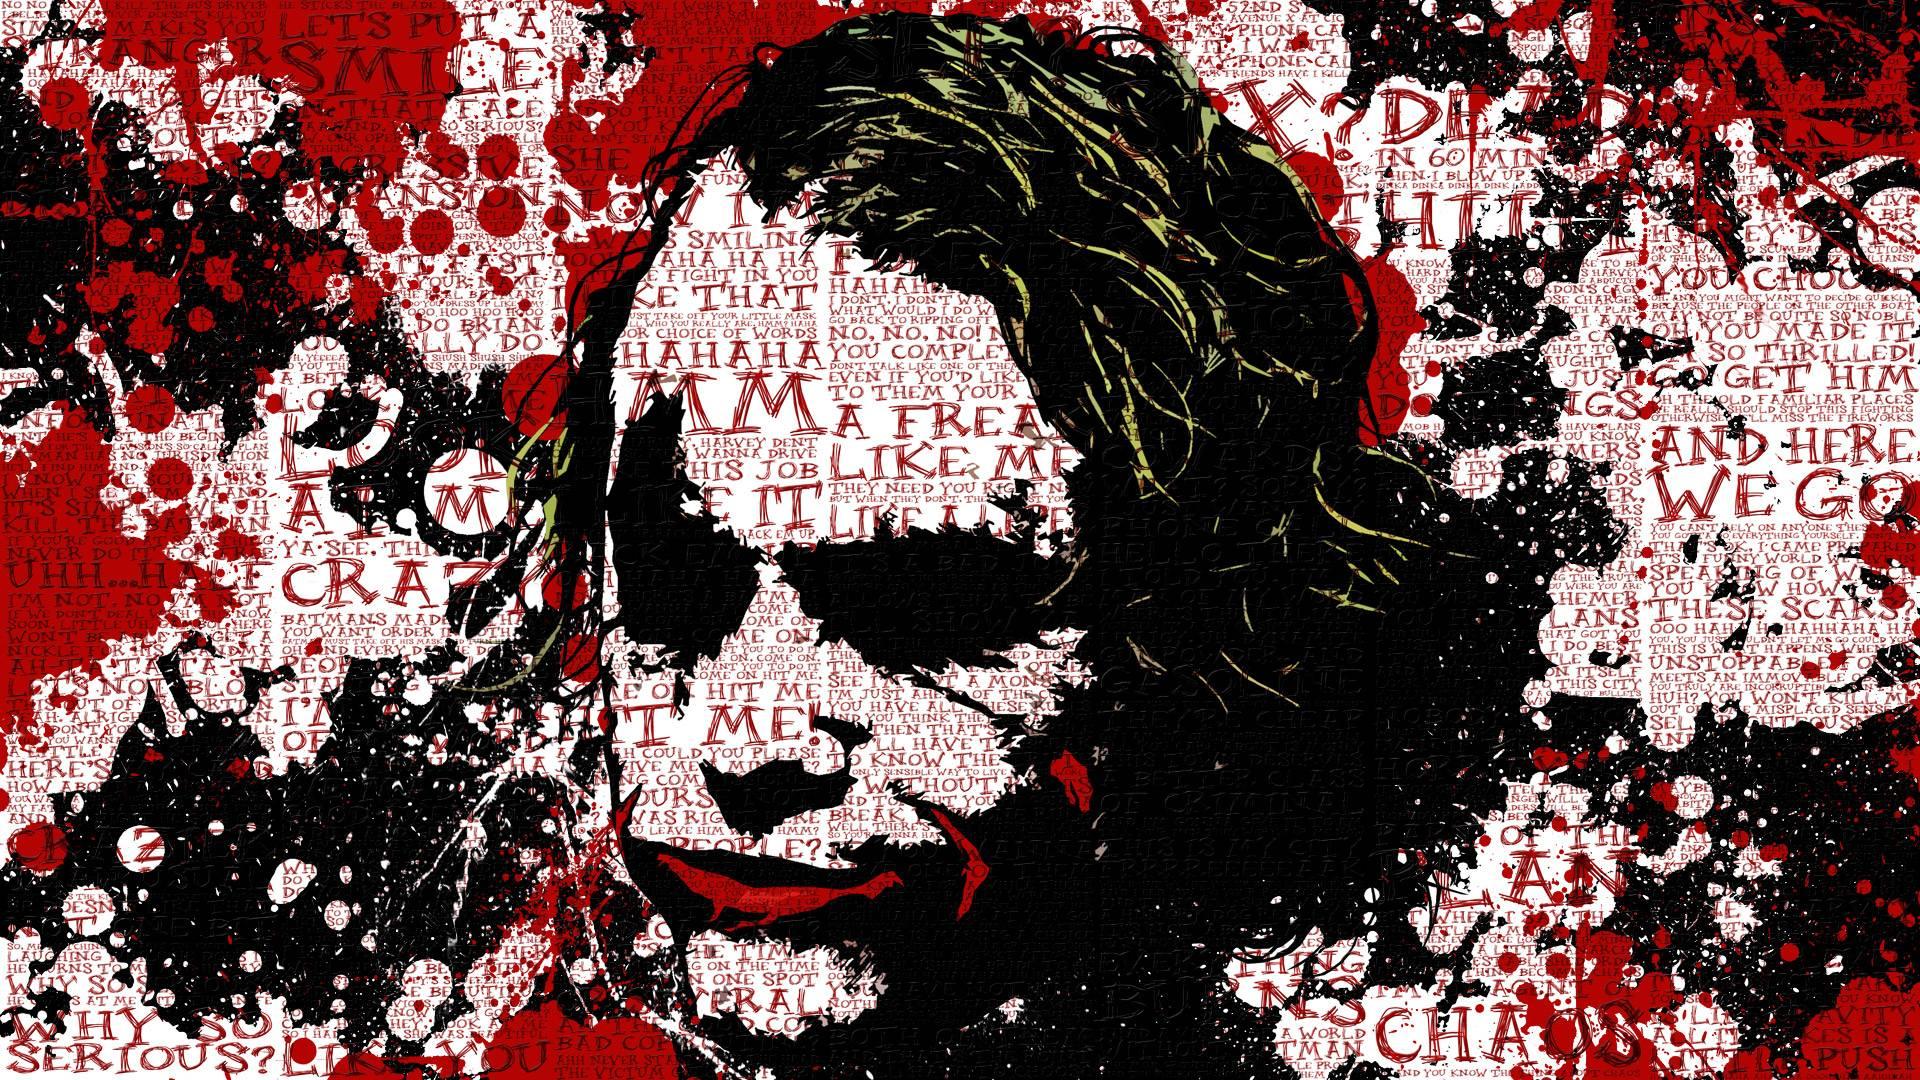 Wallpaper download joker - Dark Knight Joker Mobile Wallpaper